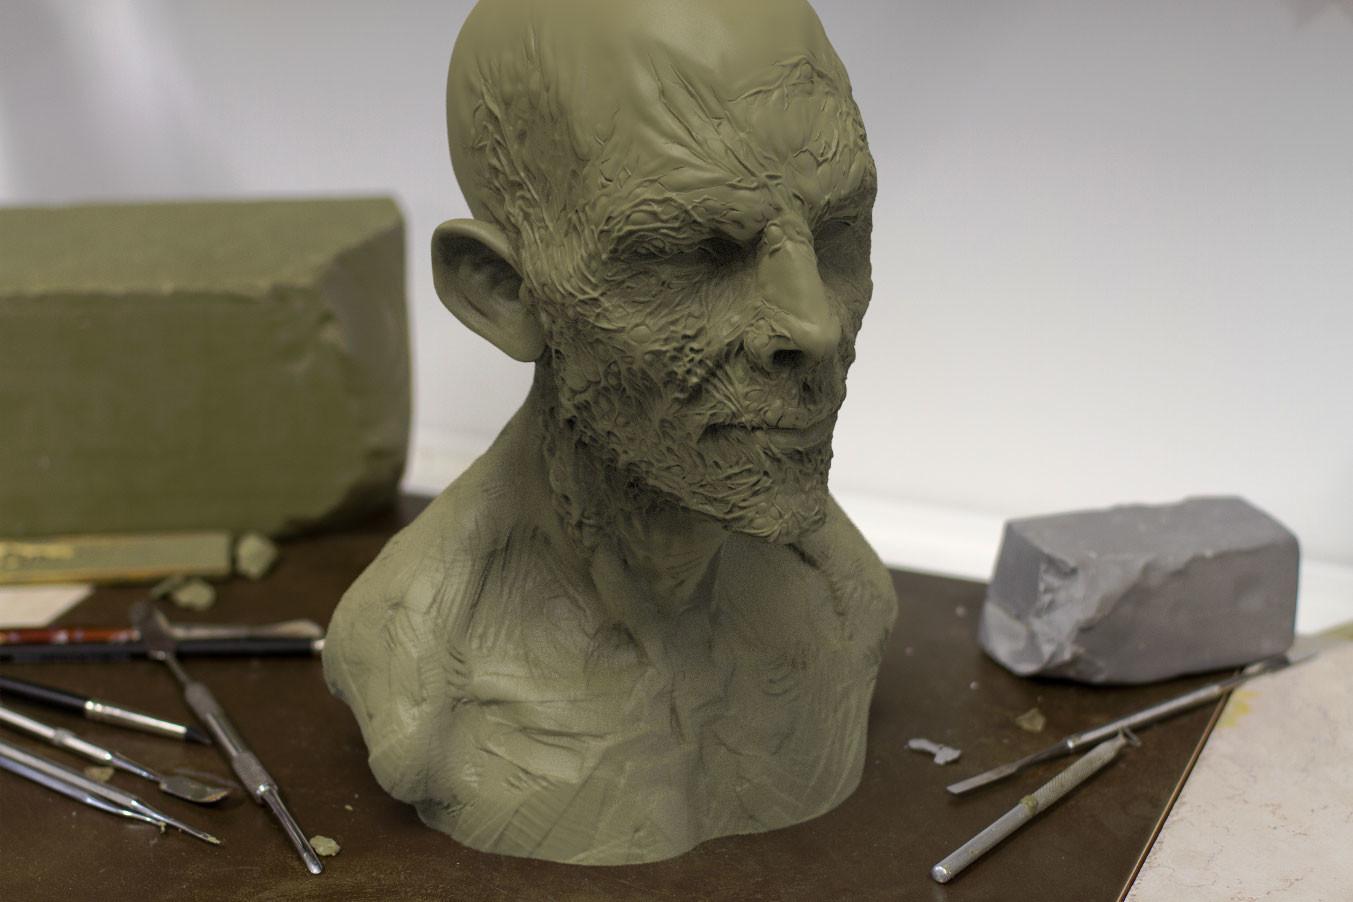 Pablo munoz gomez zombie sculpt wip